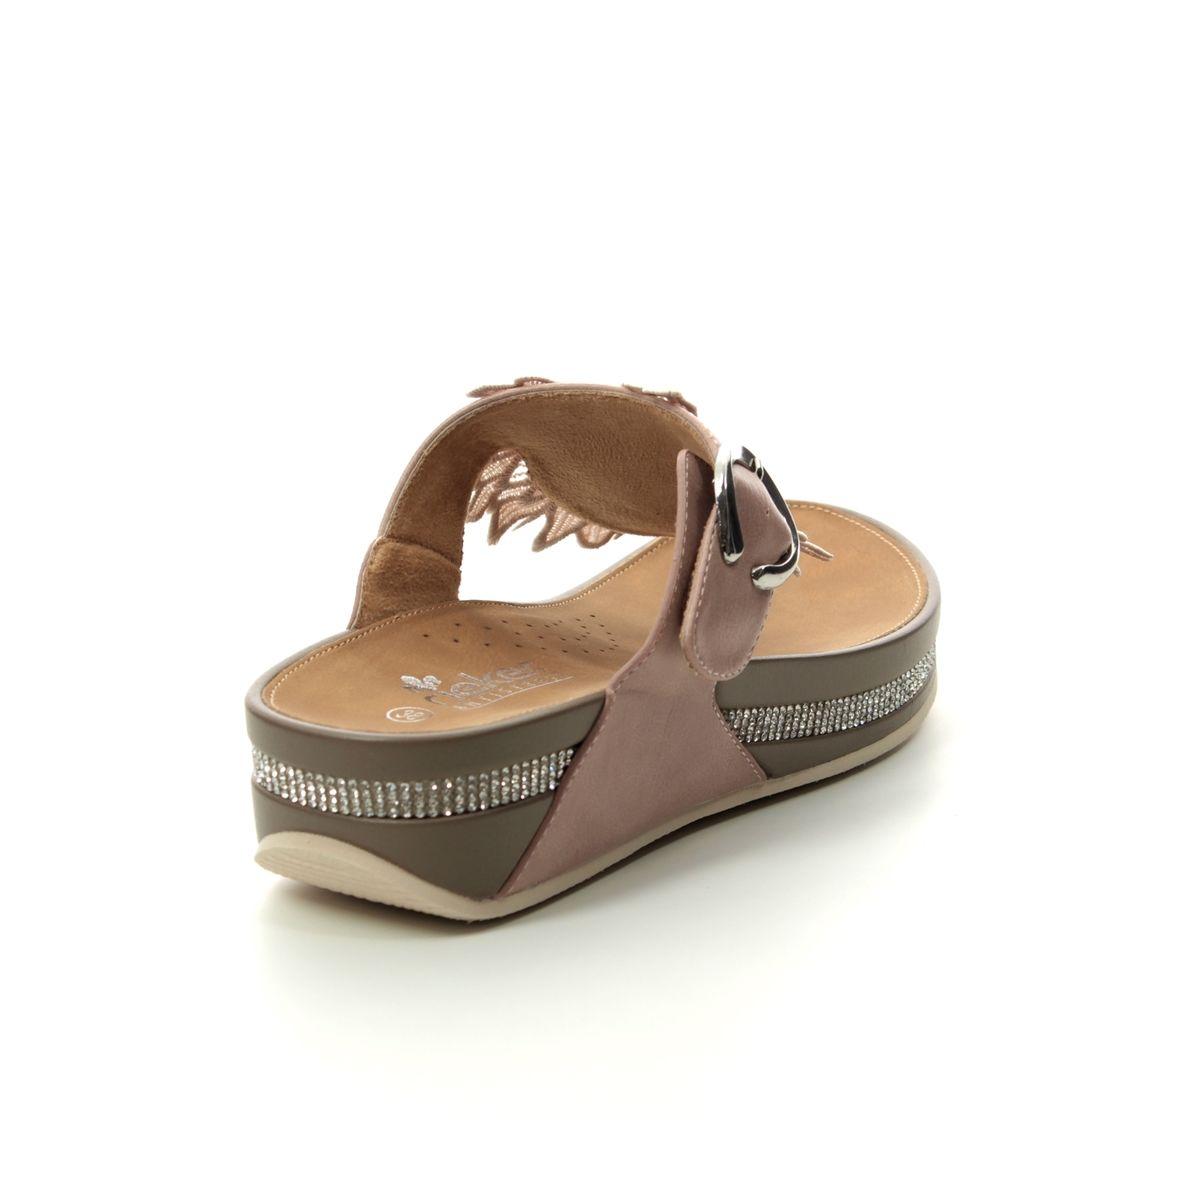 Rieker V1499 31 Pink Toe Post Sandals